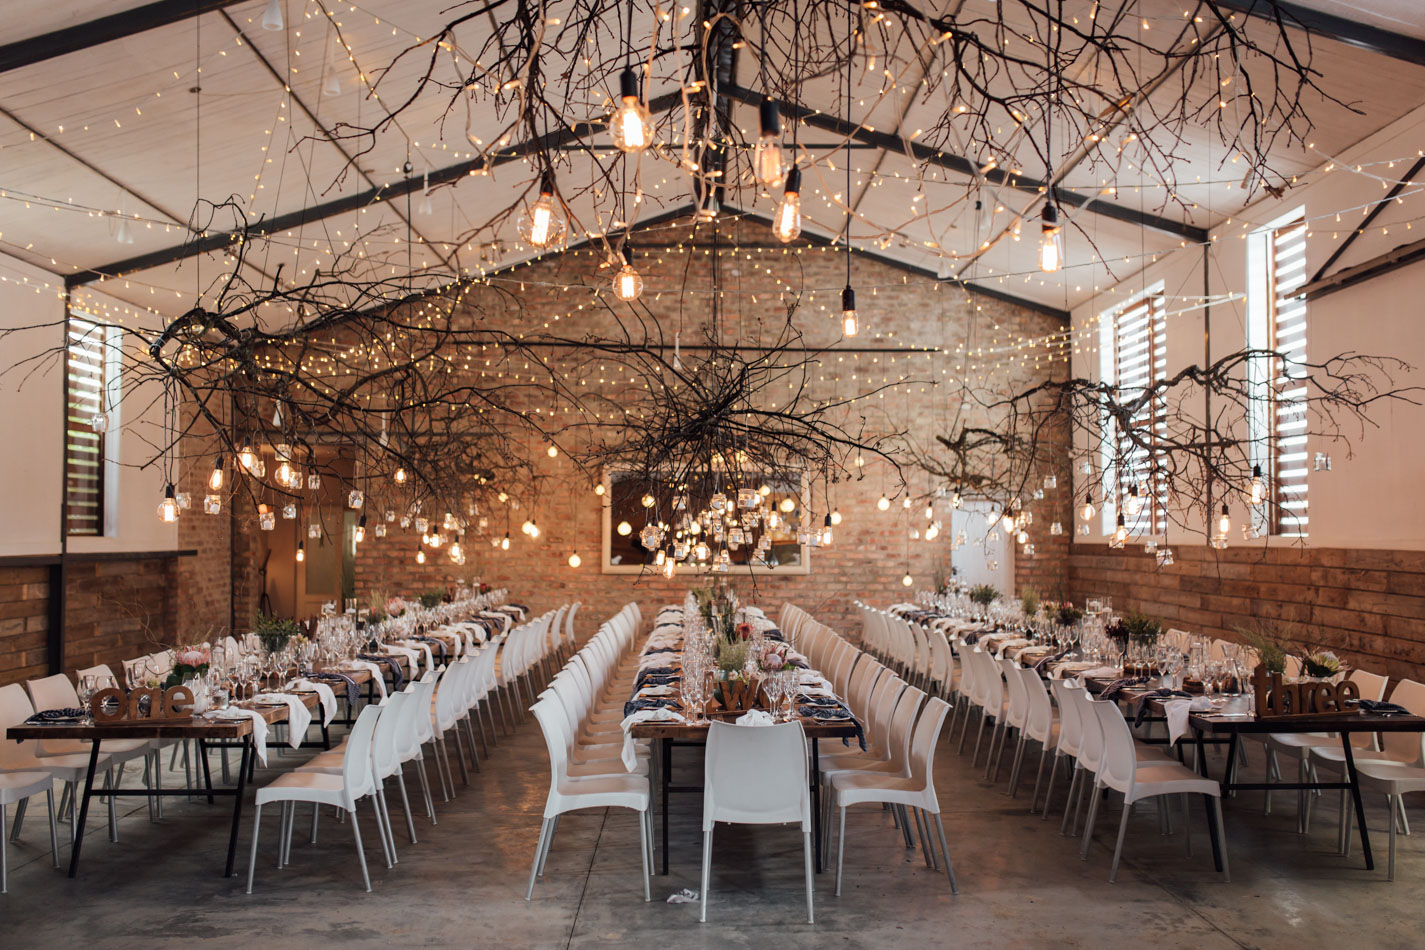 Creation_Events_Wedding_Planner_Destination_South_Africa.jpg